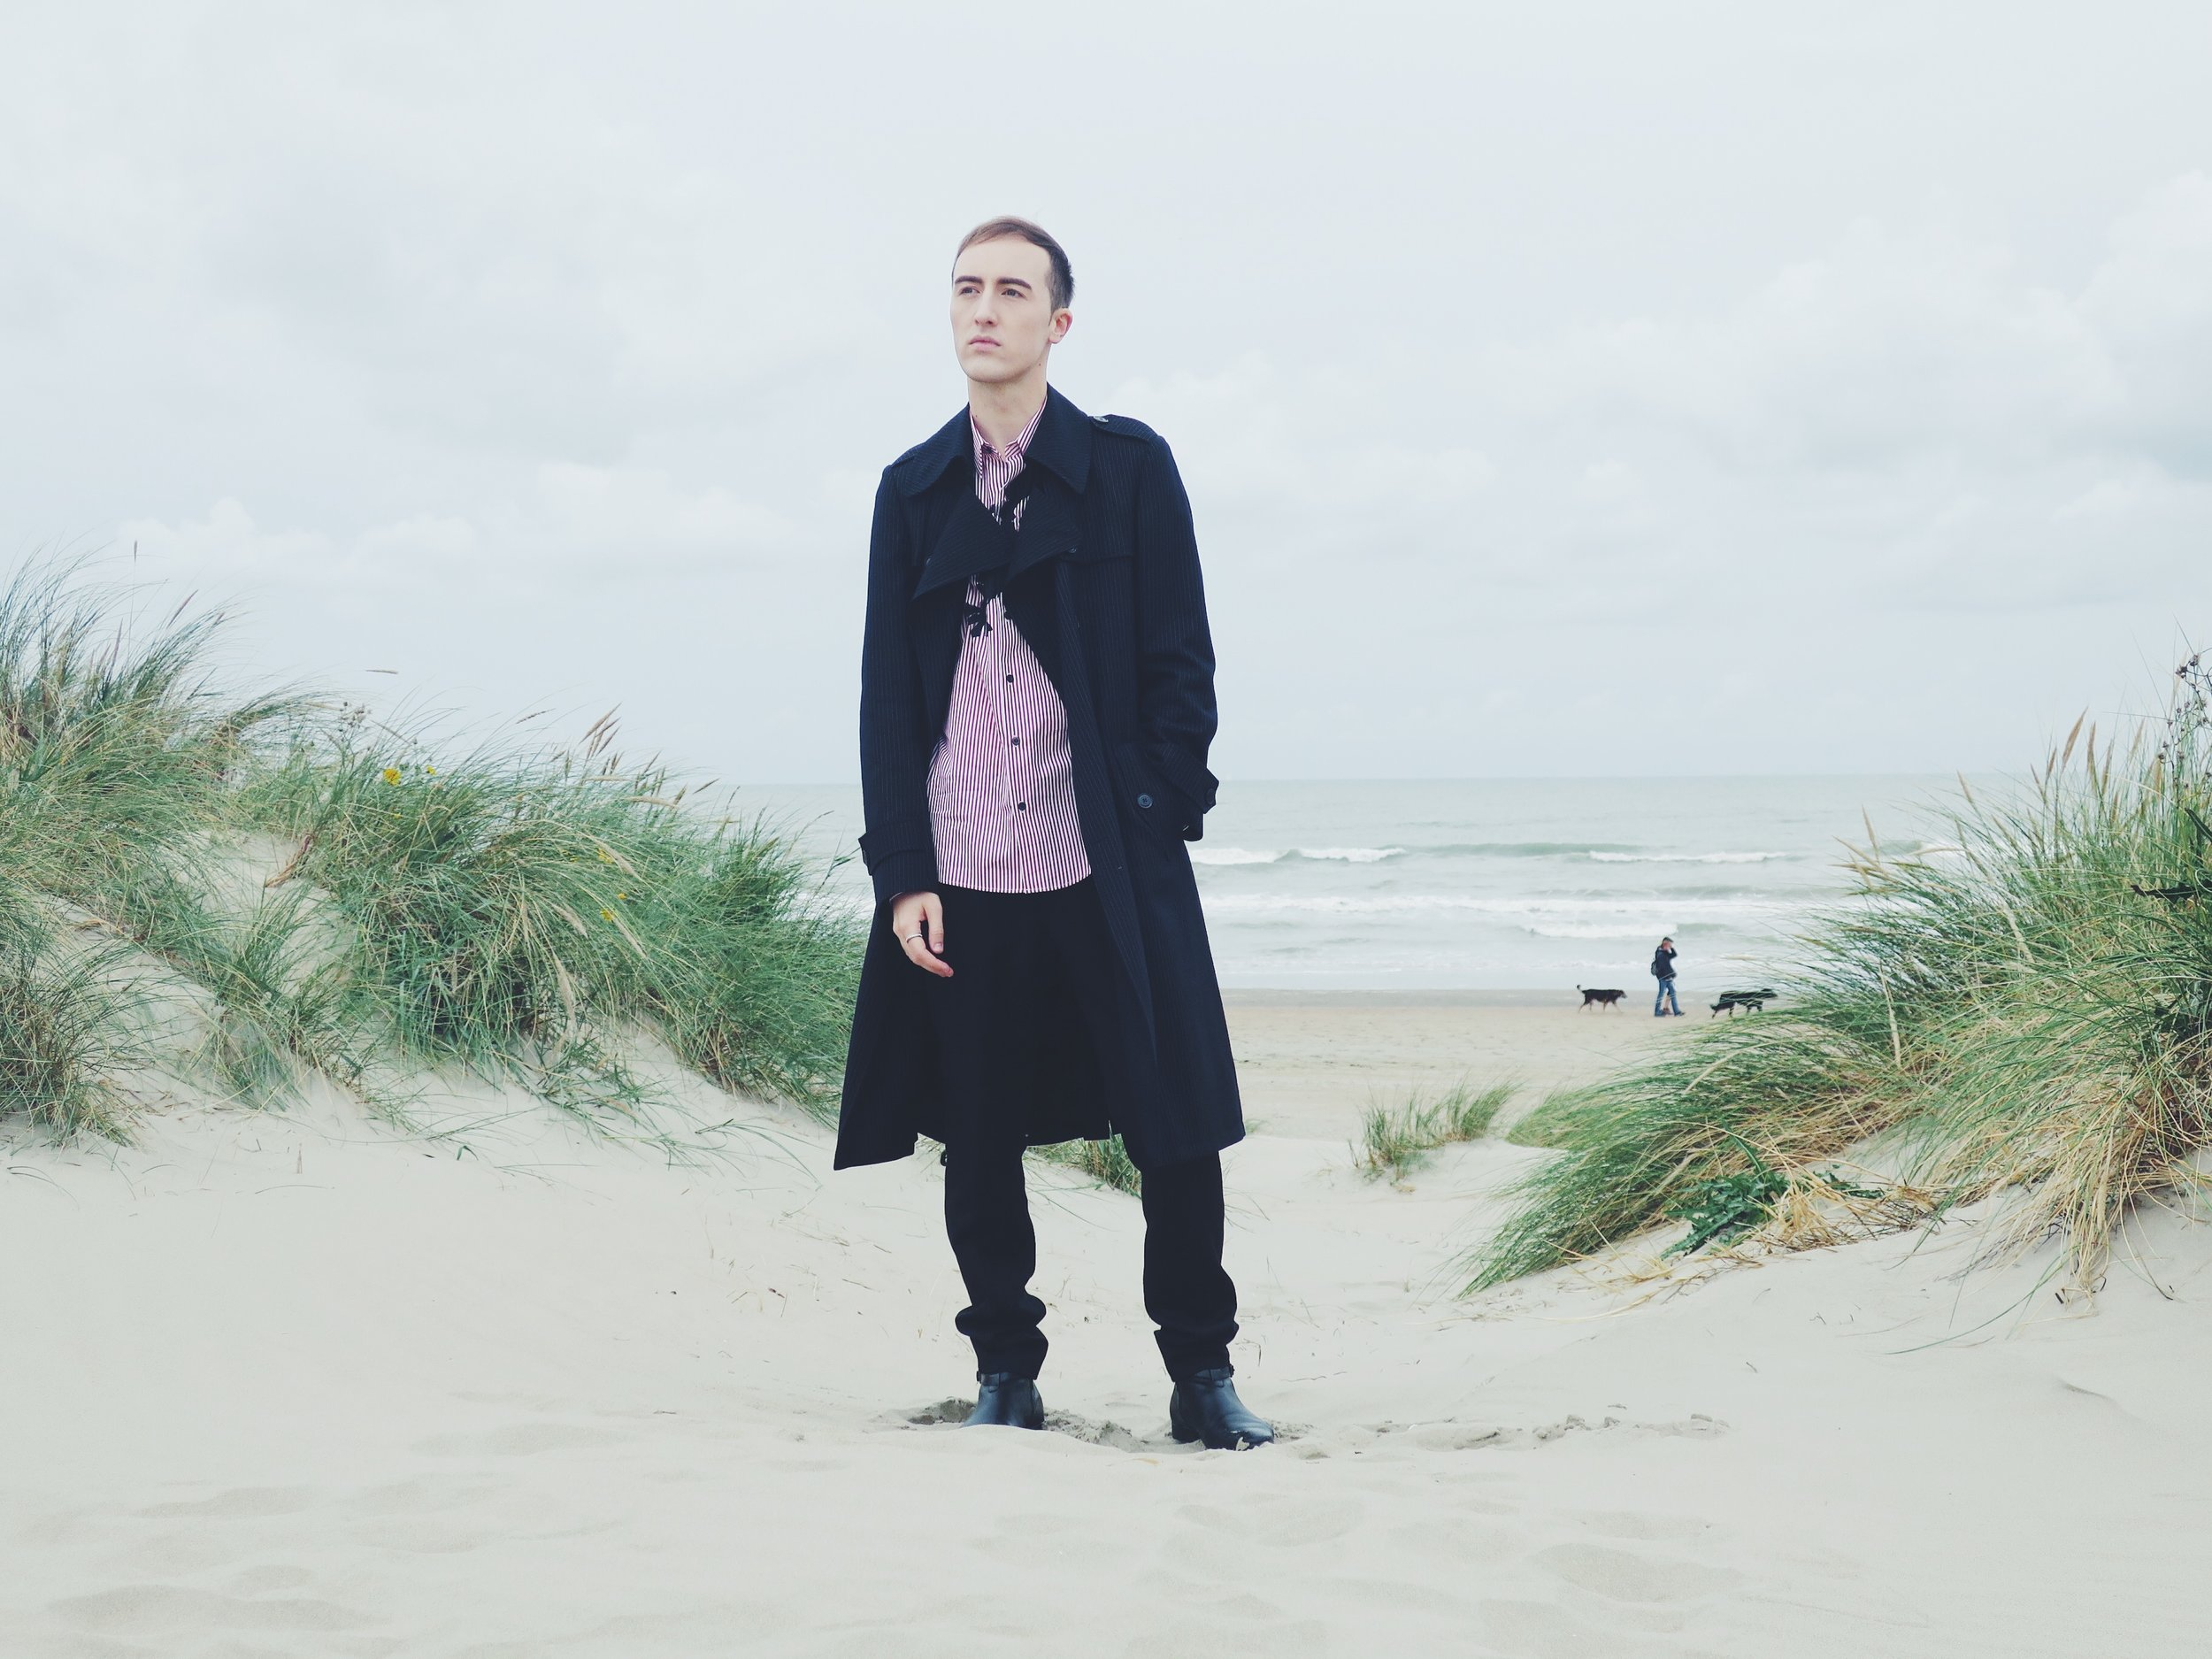 Dries Van Noten coat - Dries Van Noten shirt - Raf Simons trousers - Sacha ankle boots